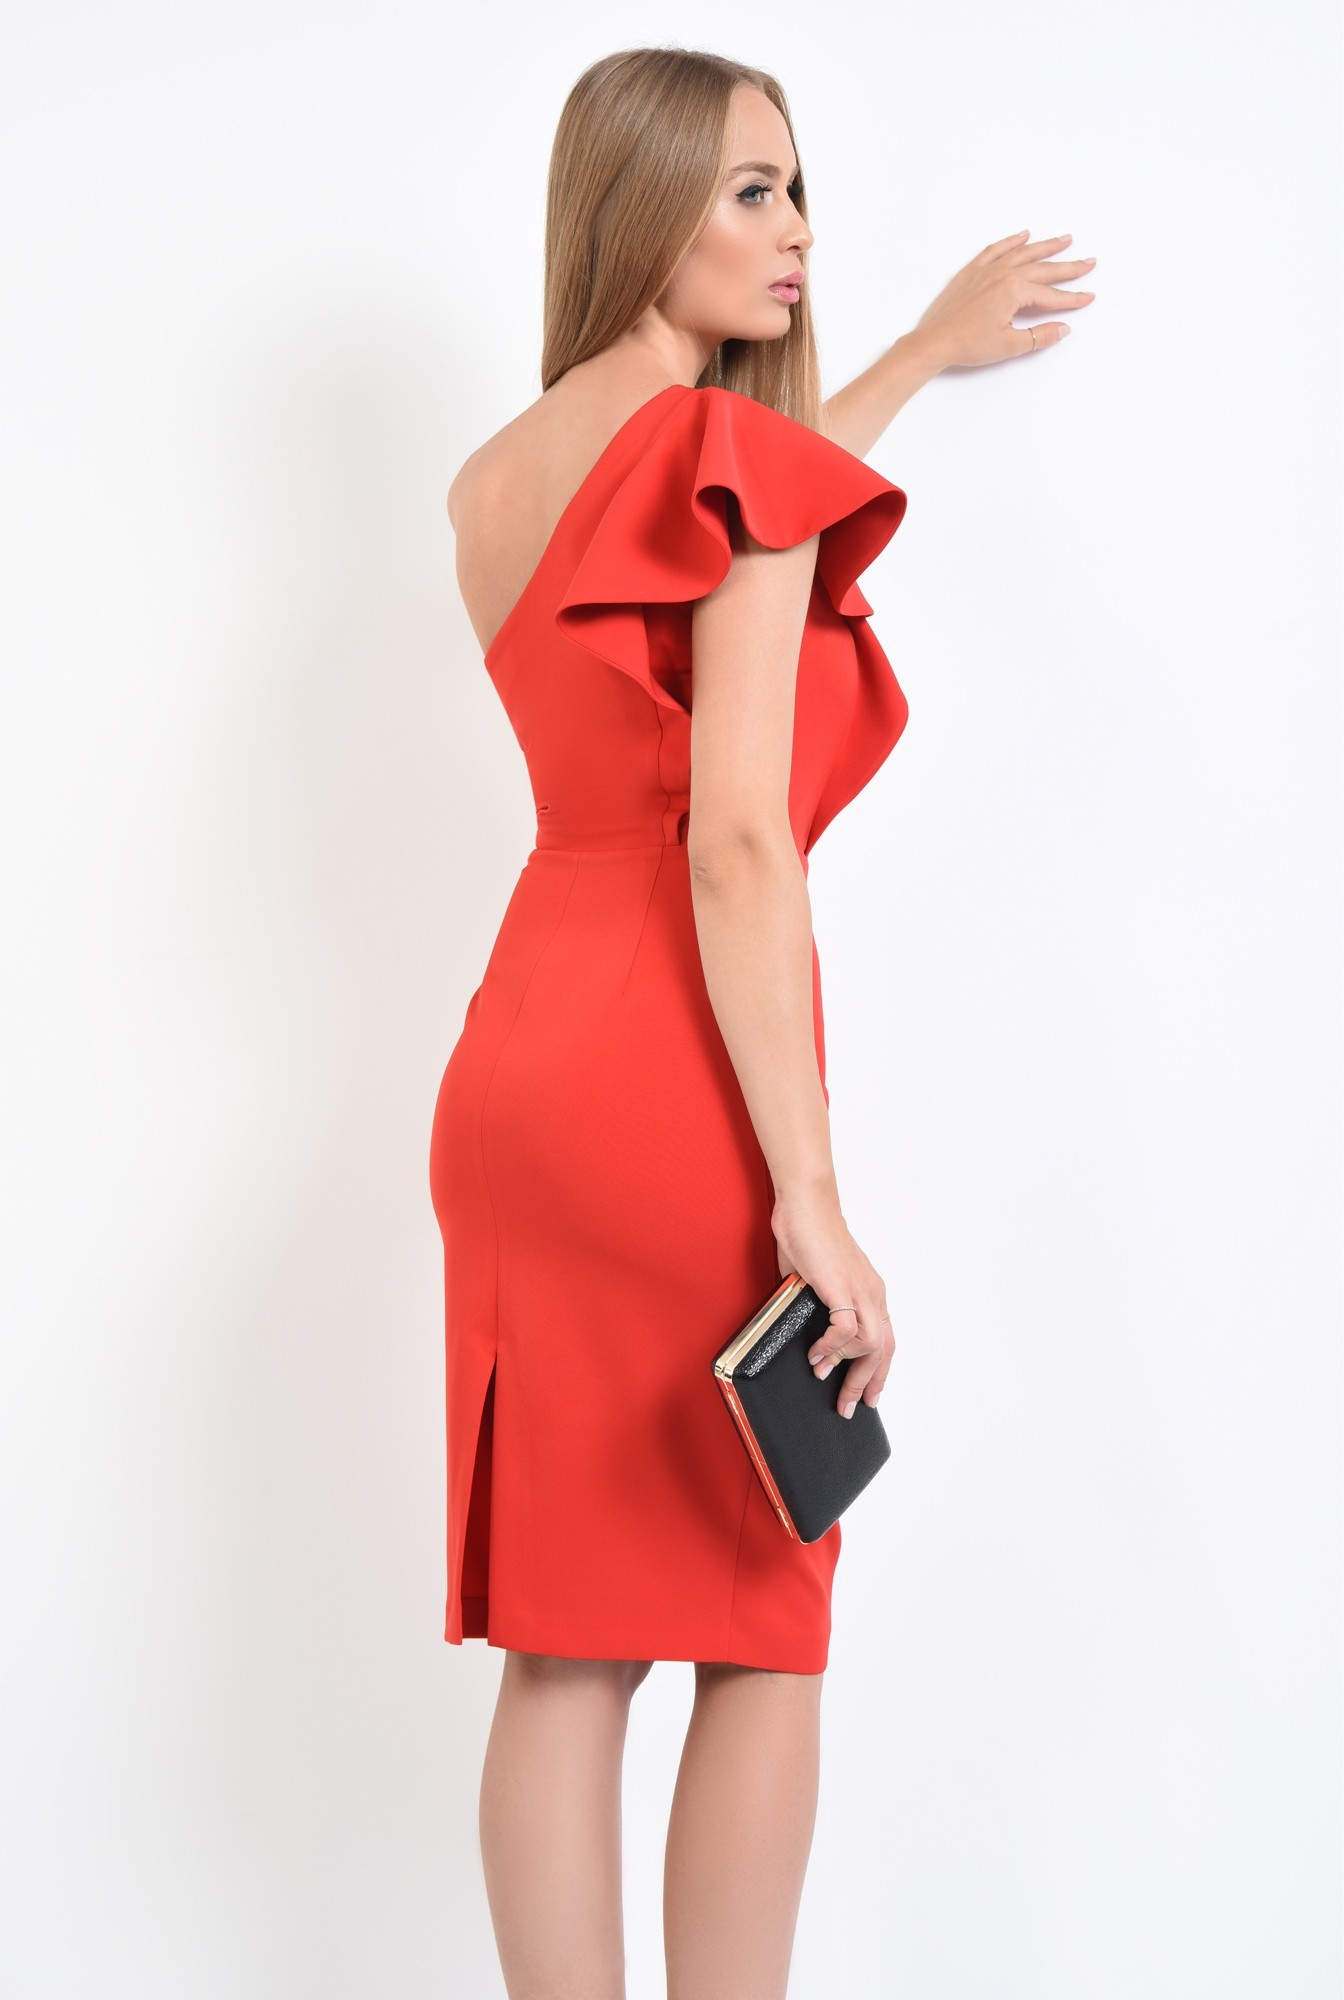 1 - rochie de ocazie, cambrata, slit la spate, rochii online